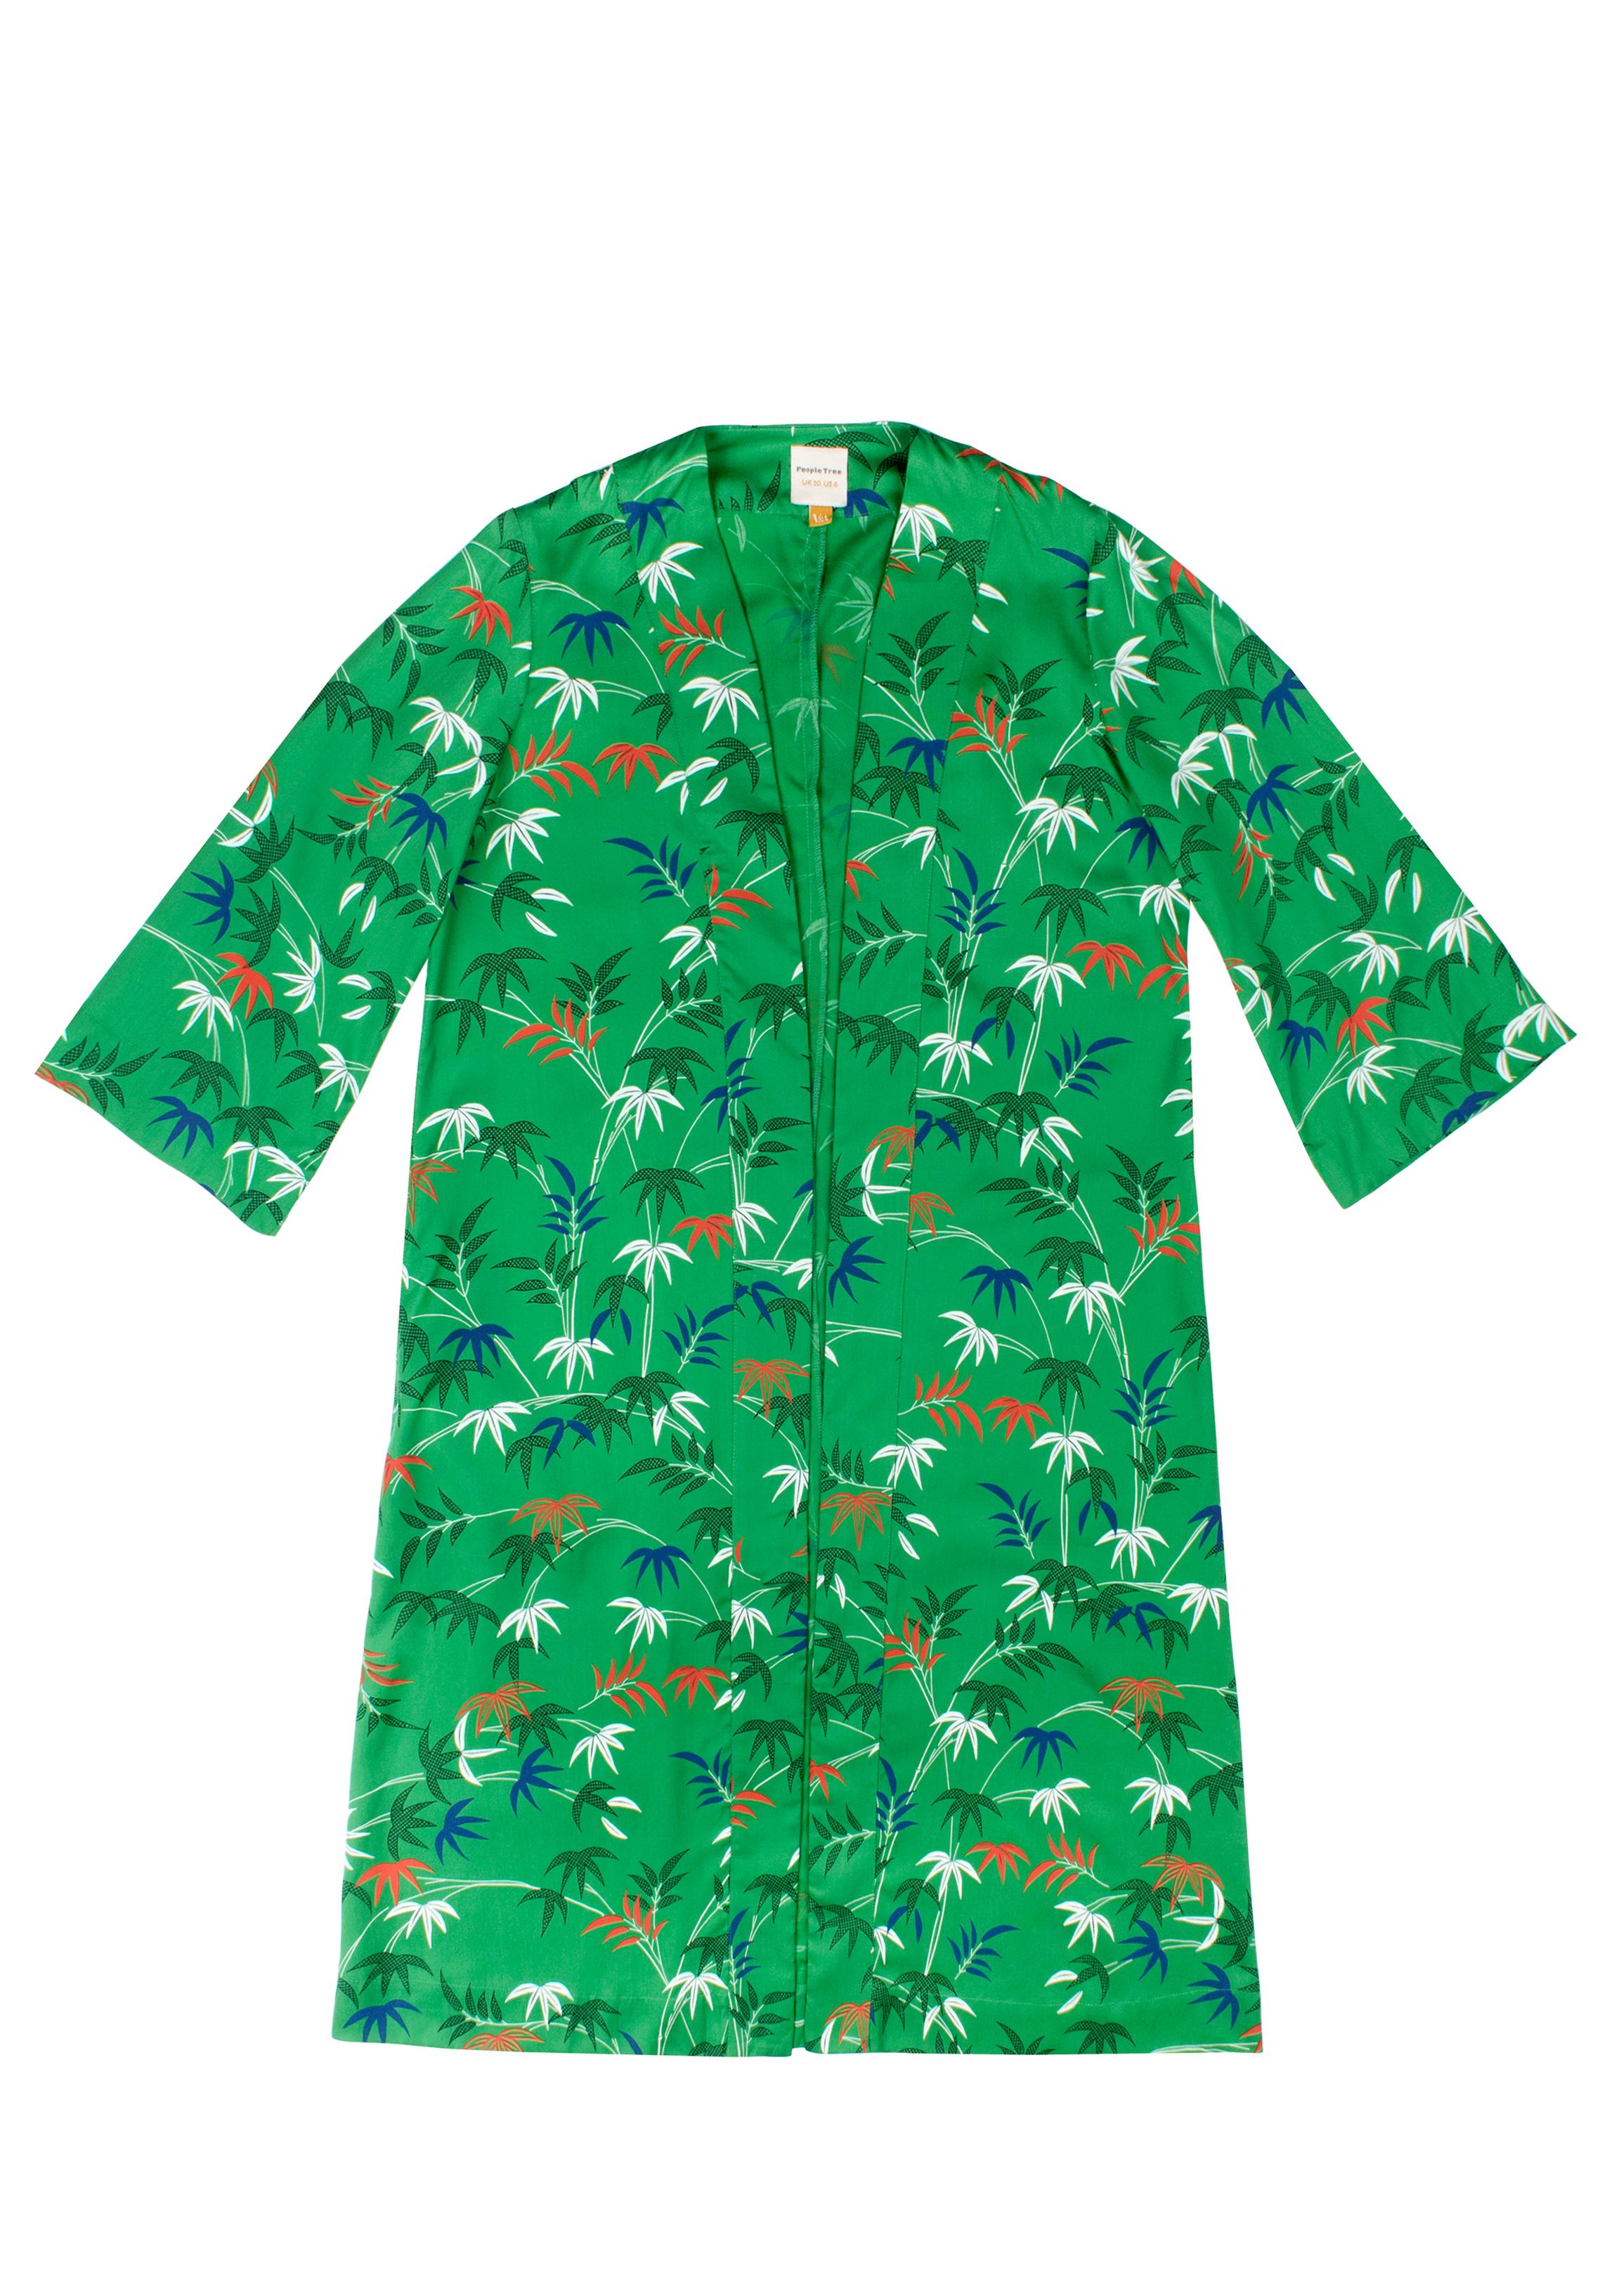 V & A Bamboo Print Jacket